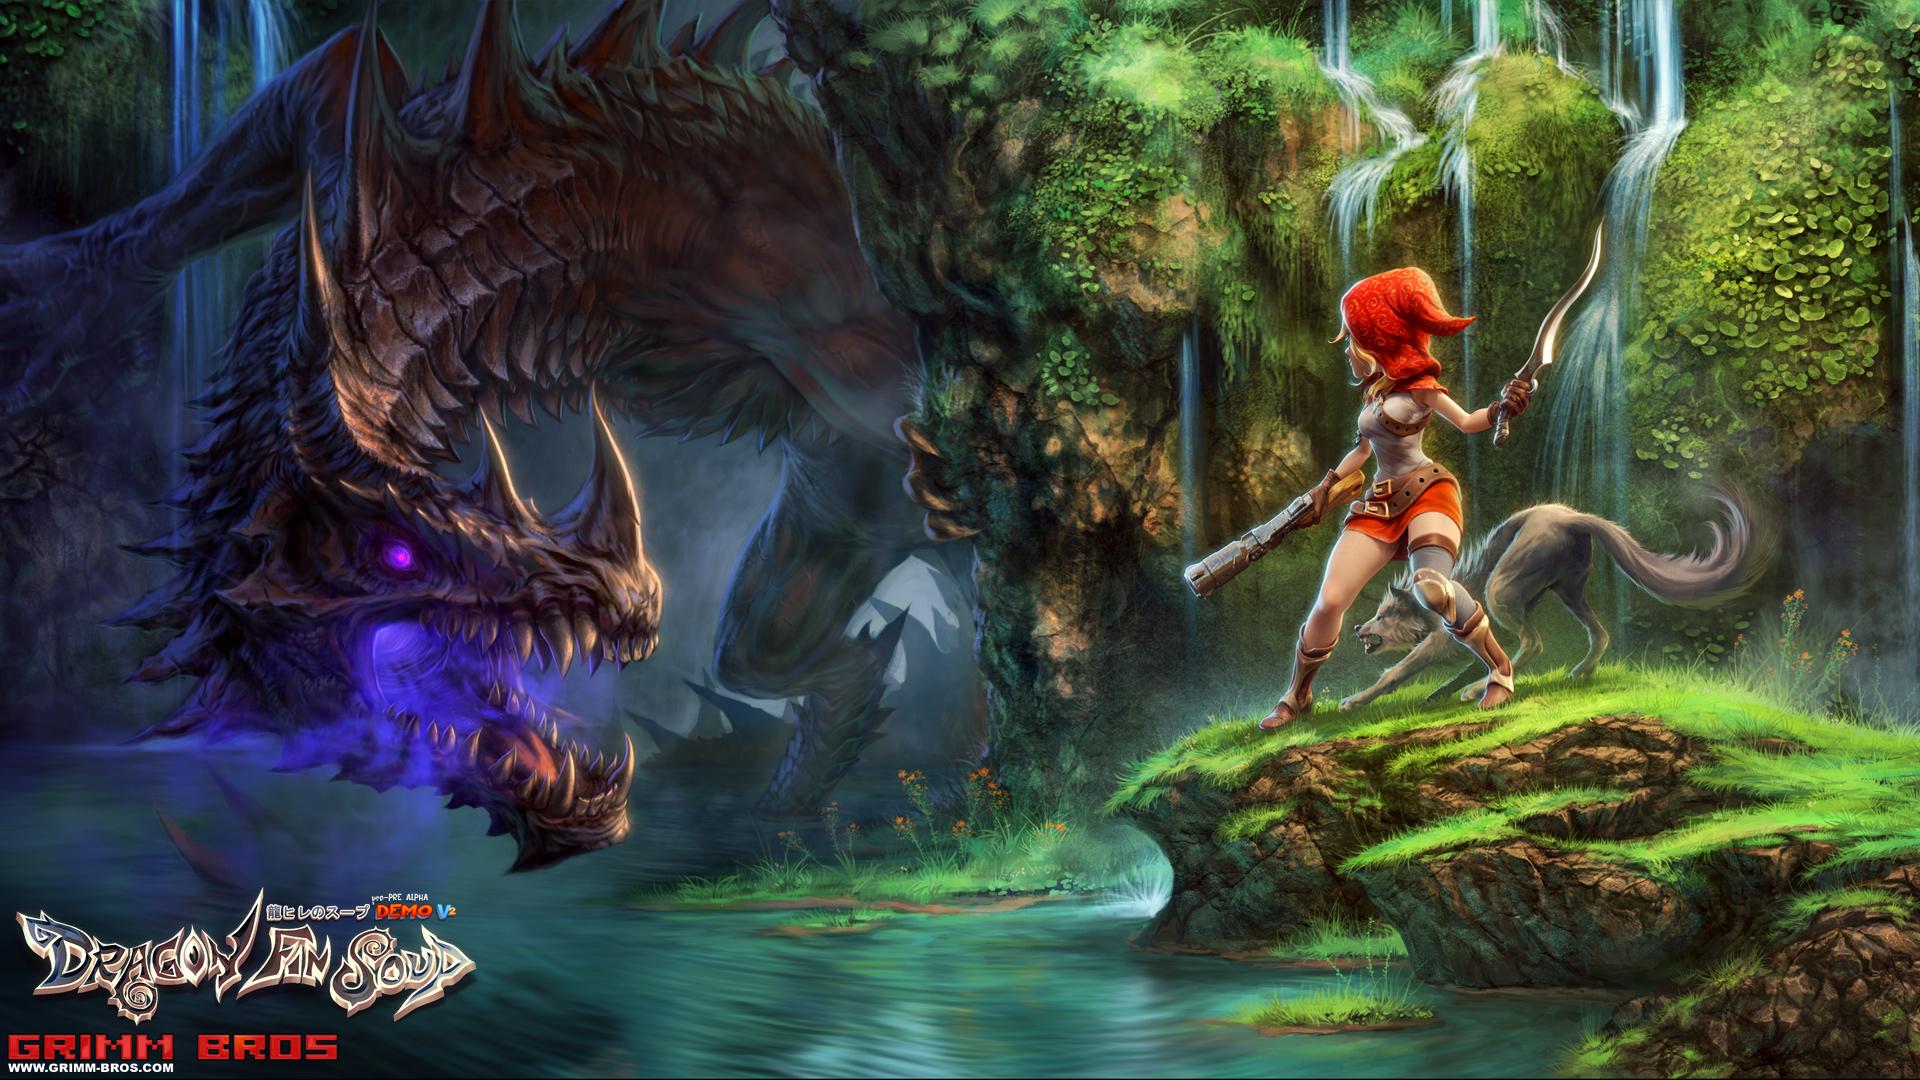 dragon fin